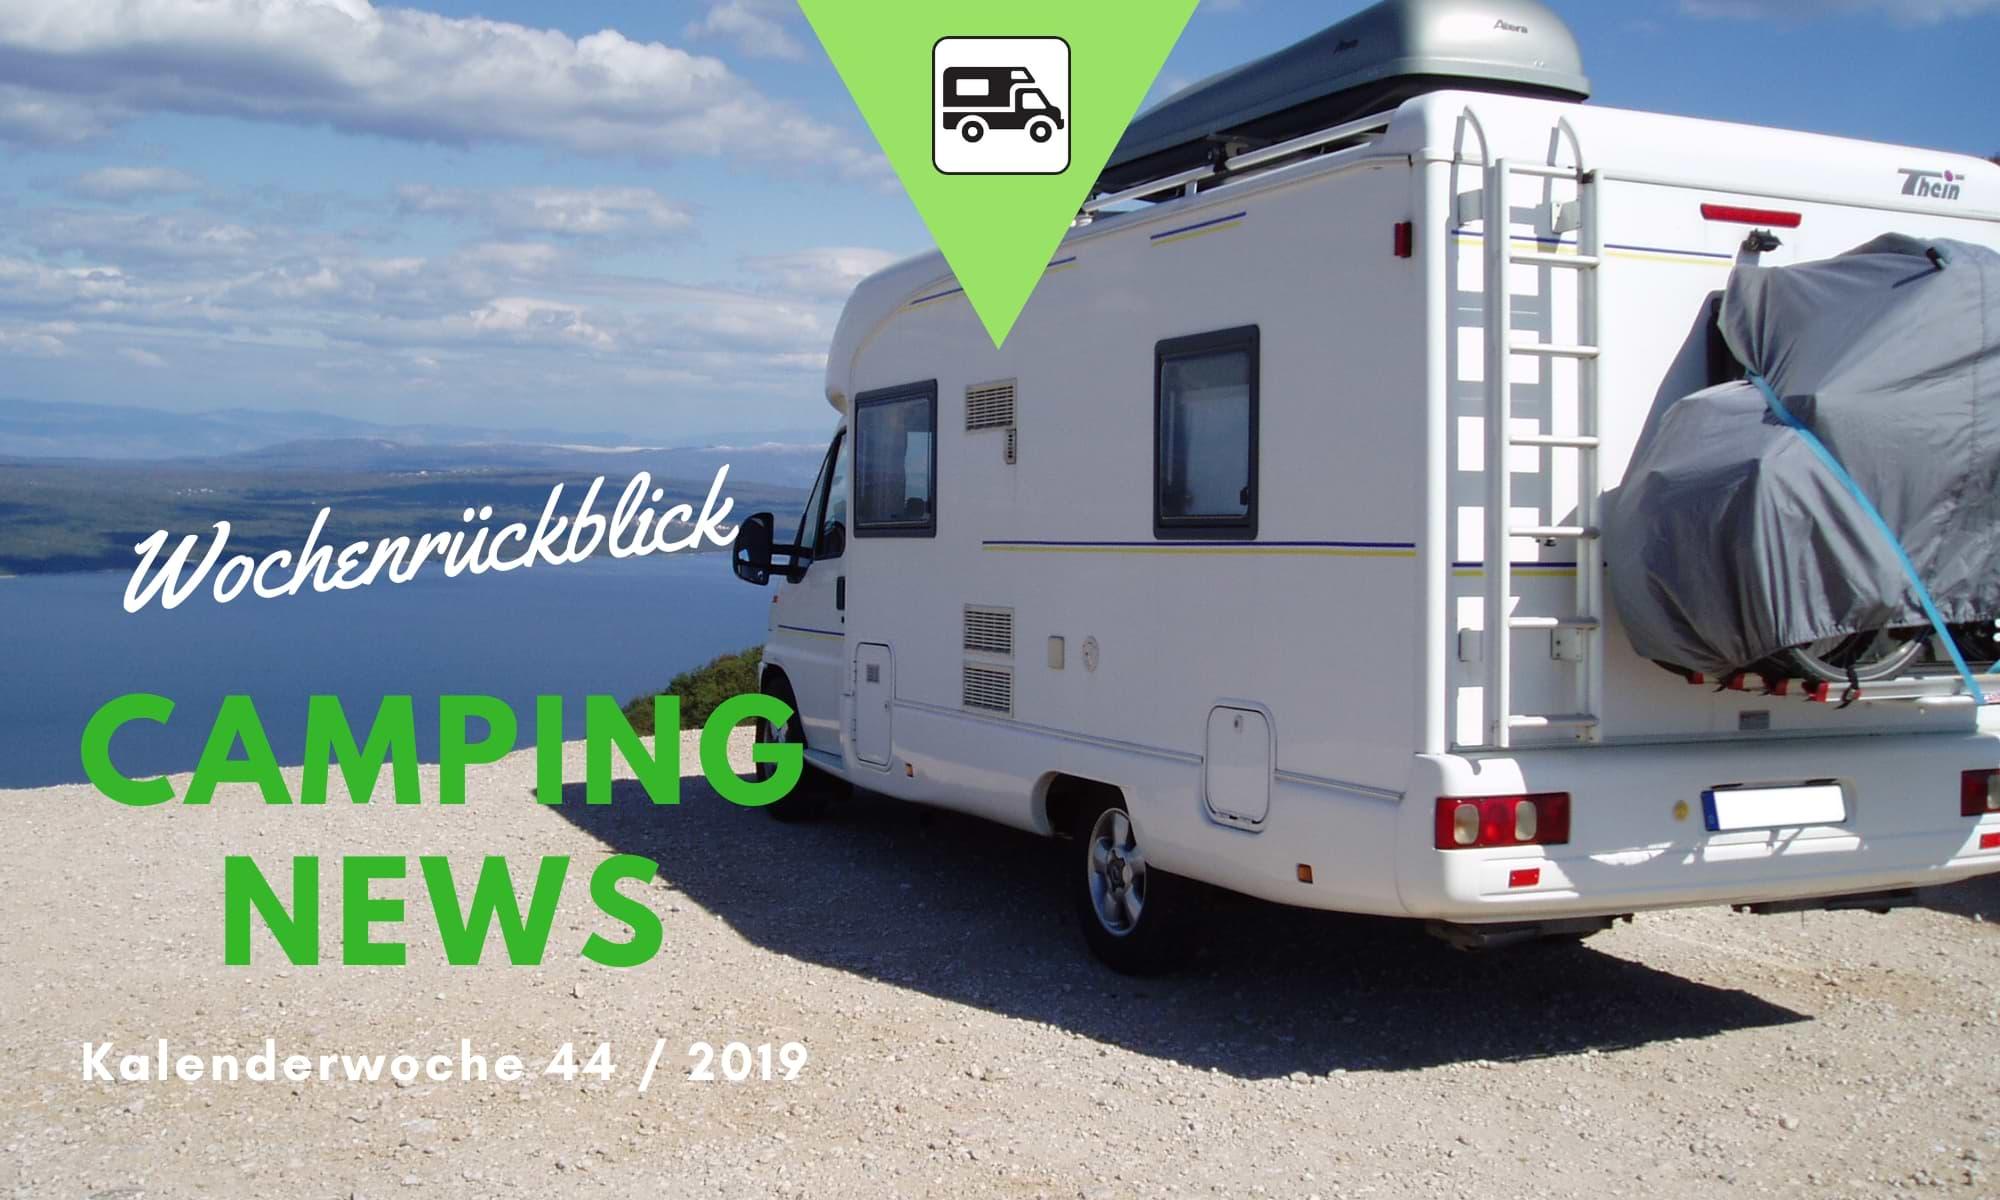 Wochenrückblick Camping News KW44-2019